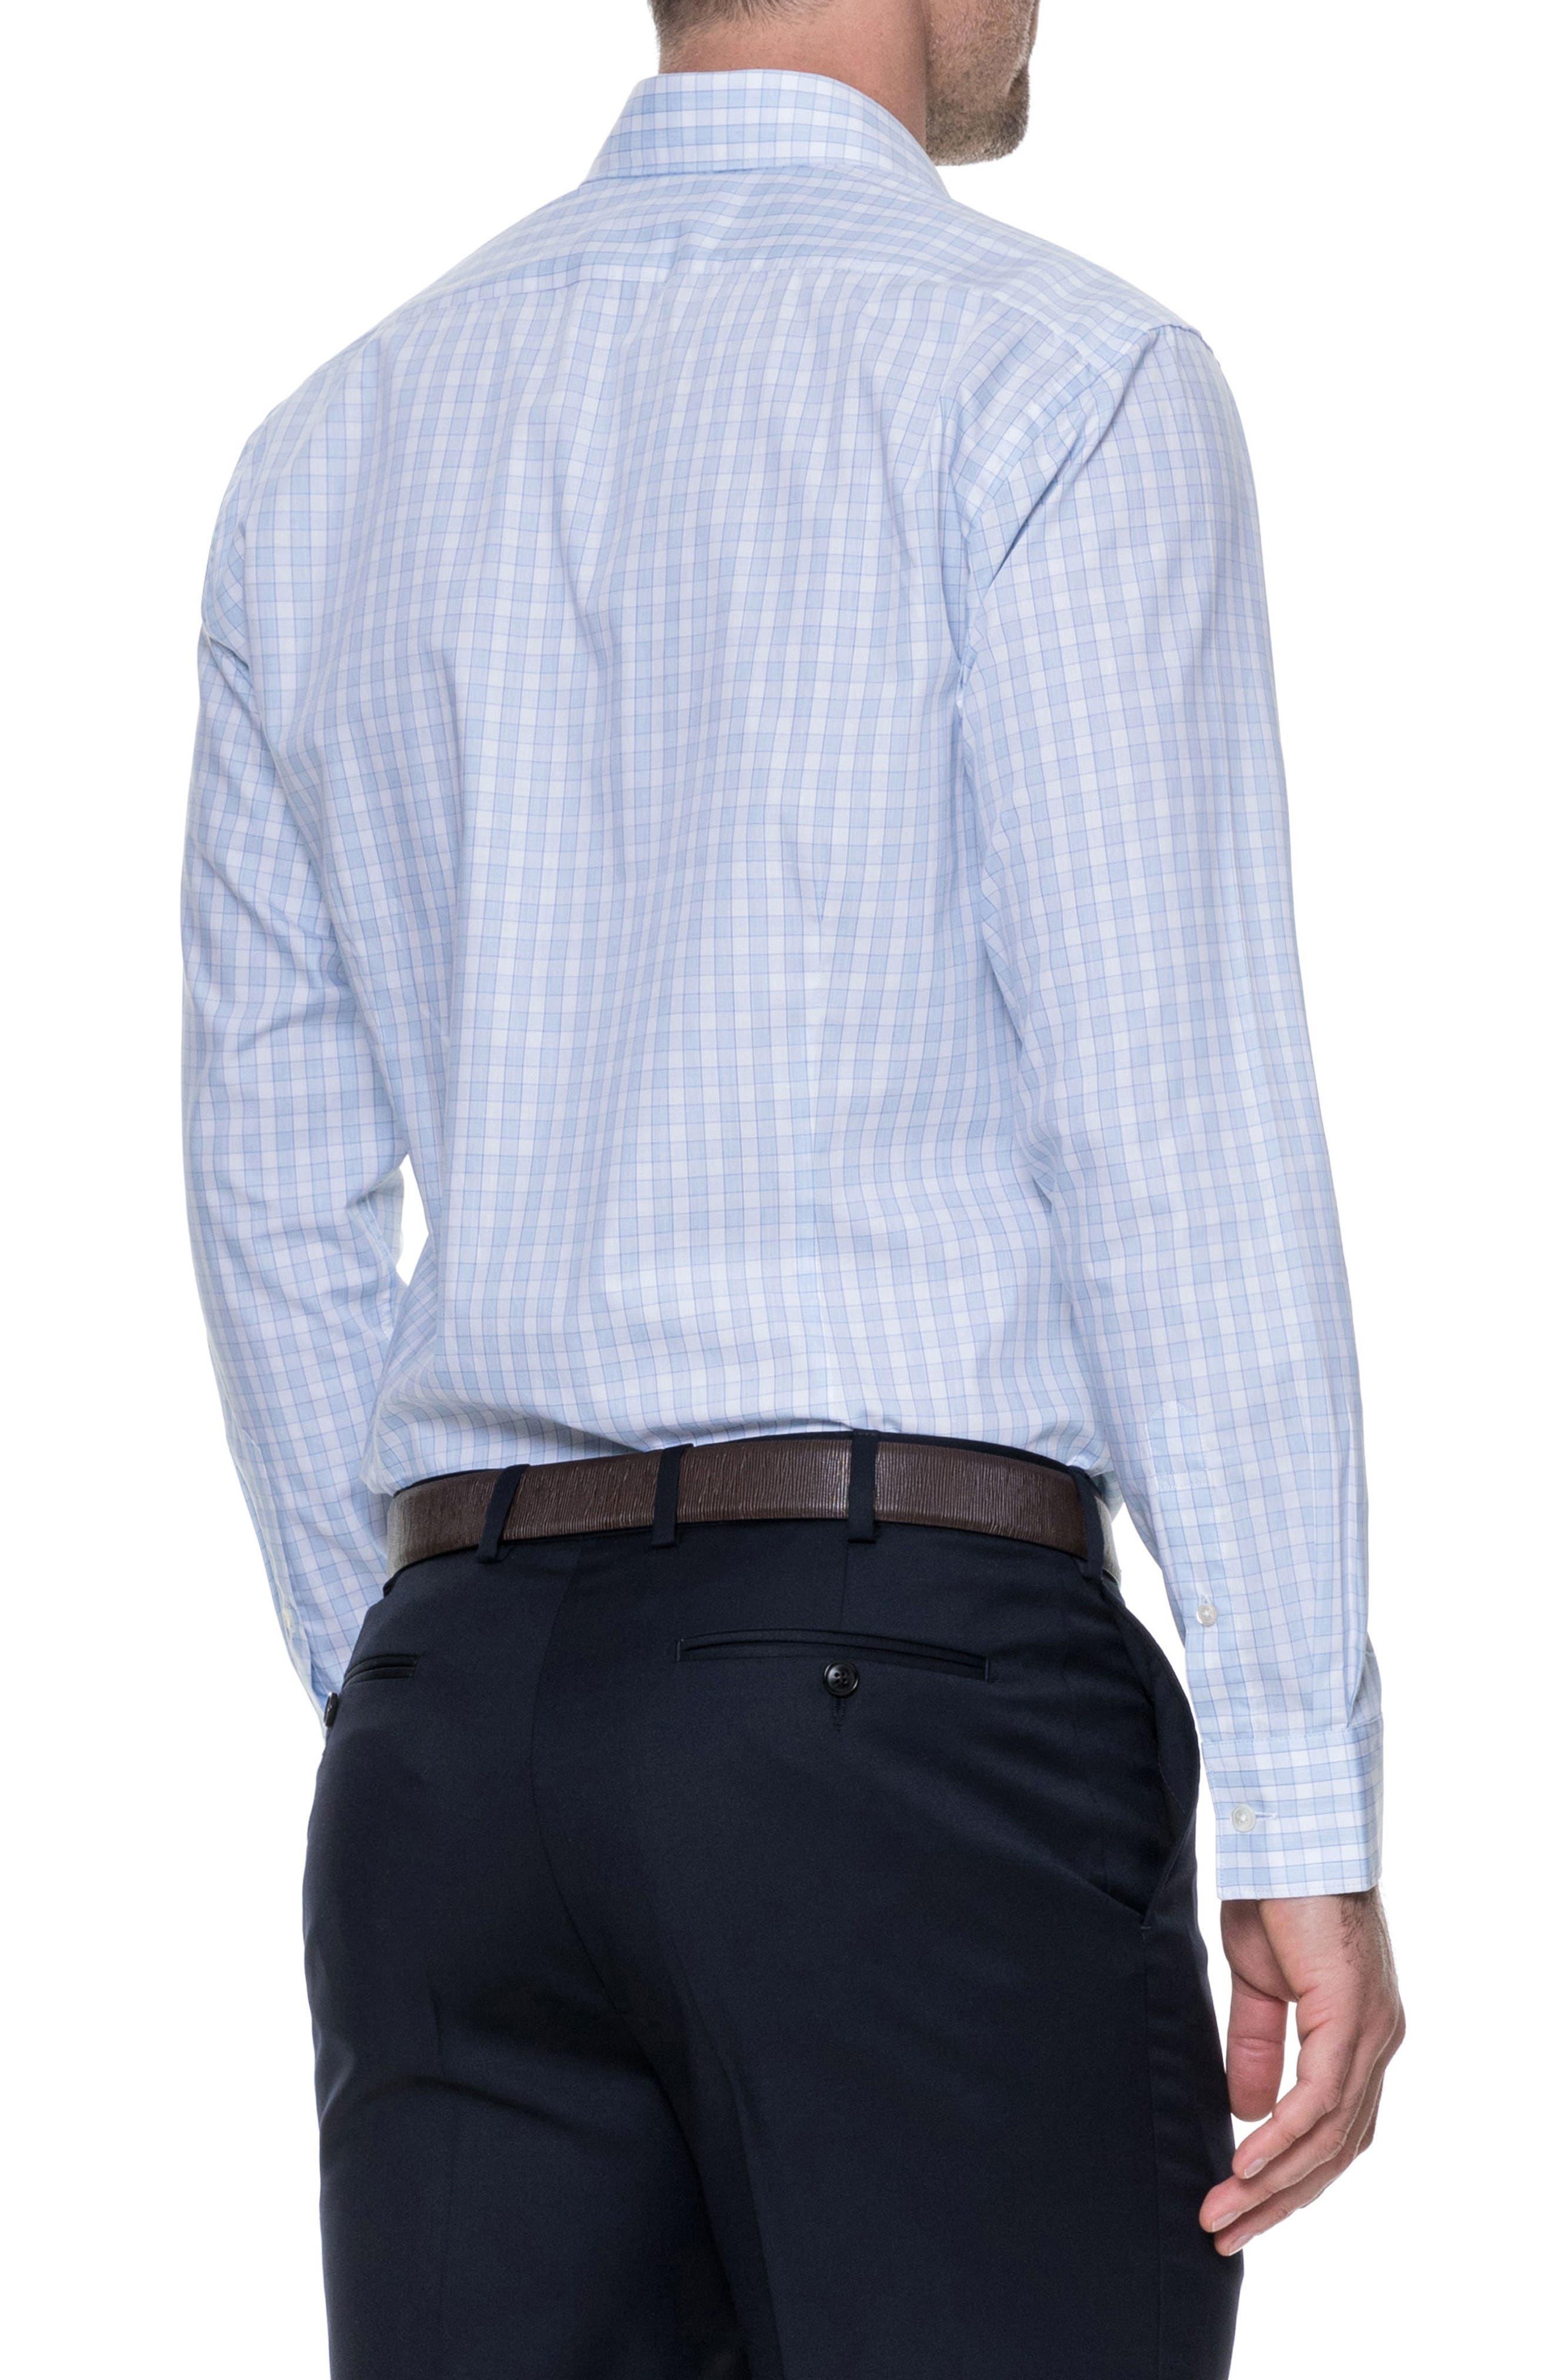 Brackley Slim Fit Sport Shirt,                             Alternate thumbnail 3, color,                             Sky